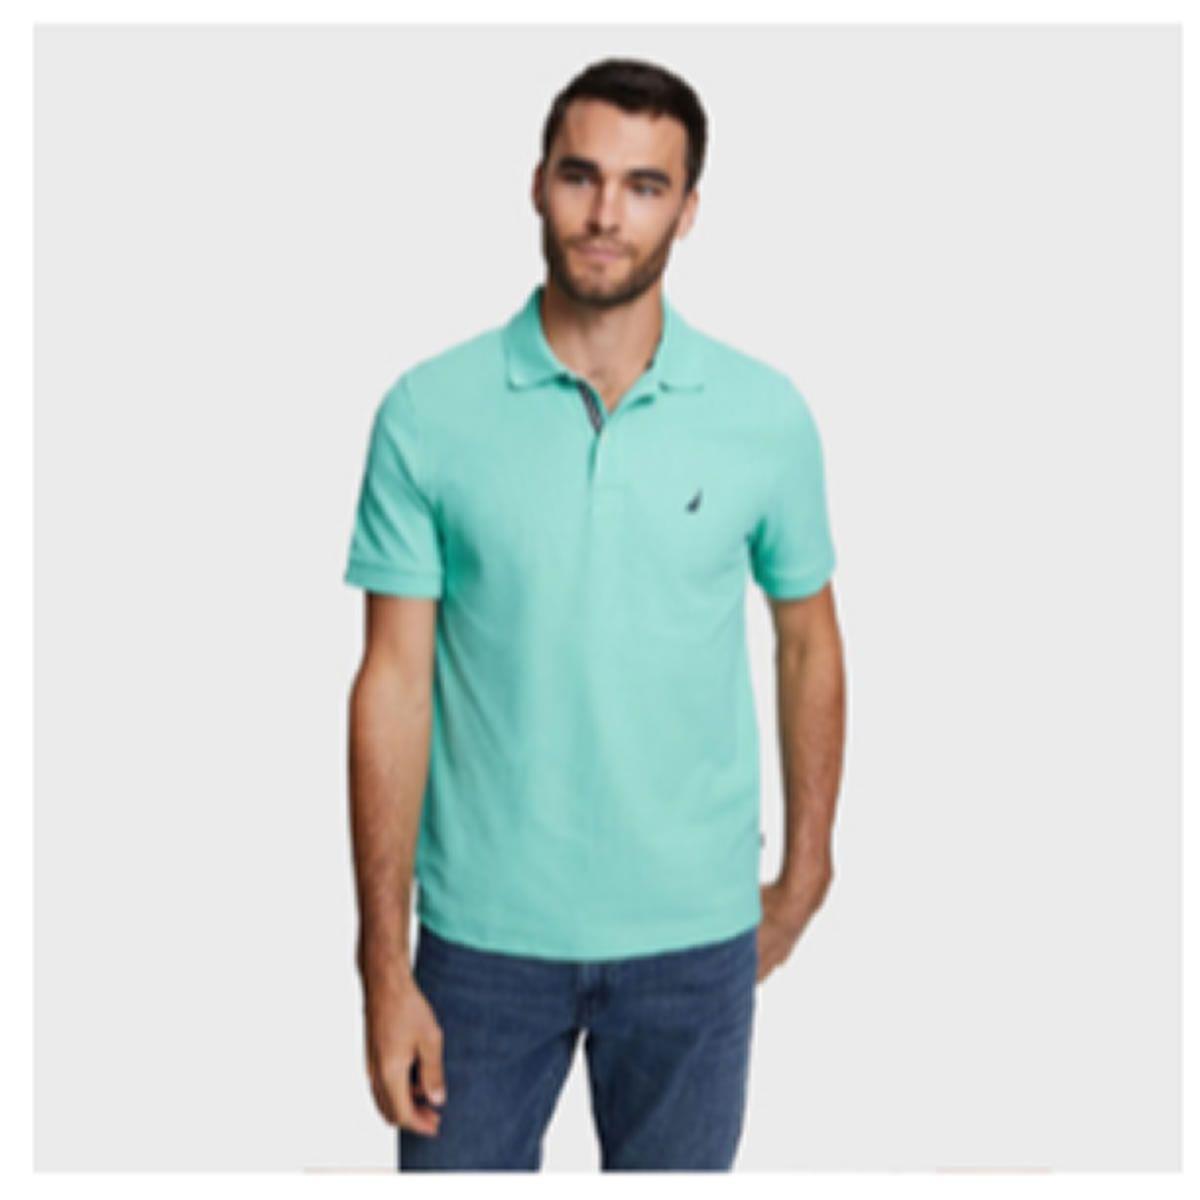 d60840eac8d70 Nautica for Men - Men s Clothing - Macy s